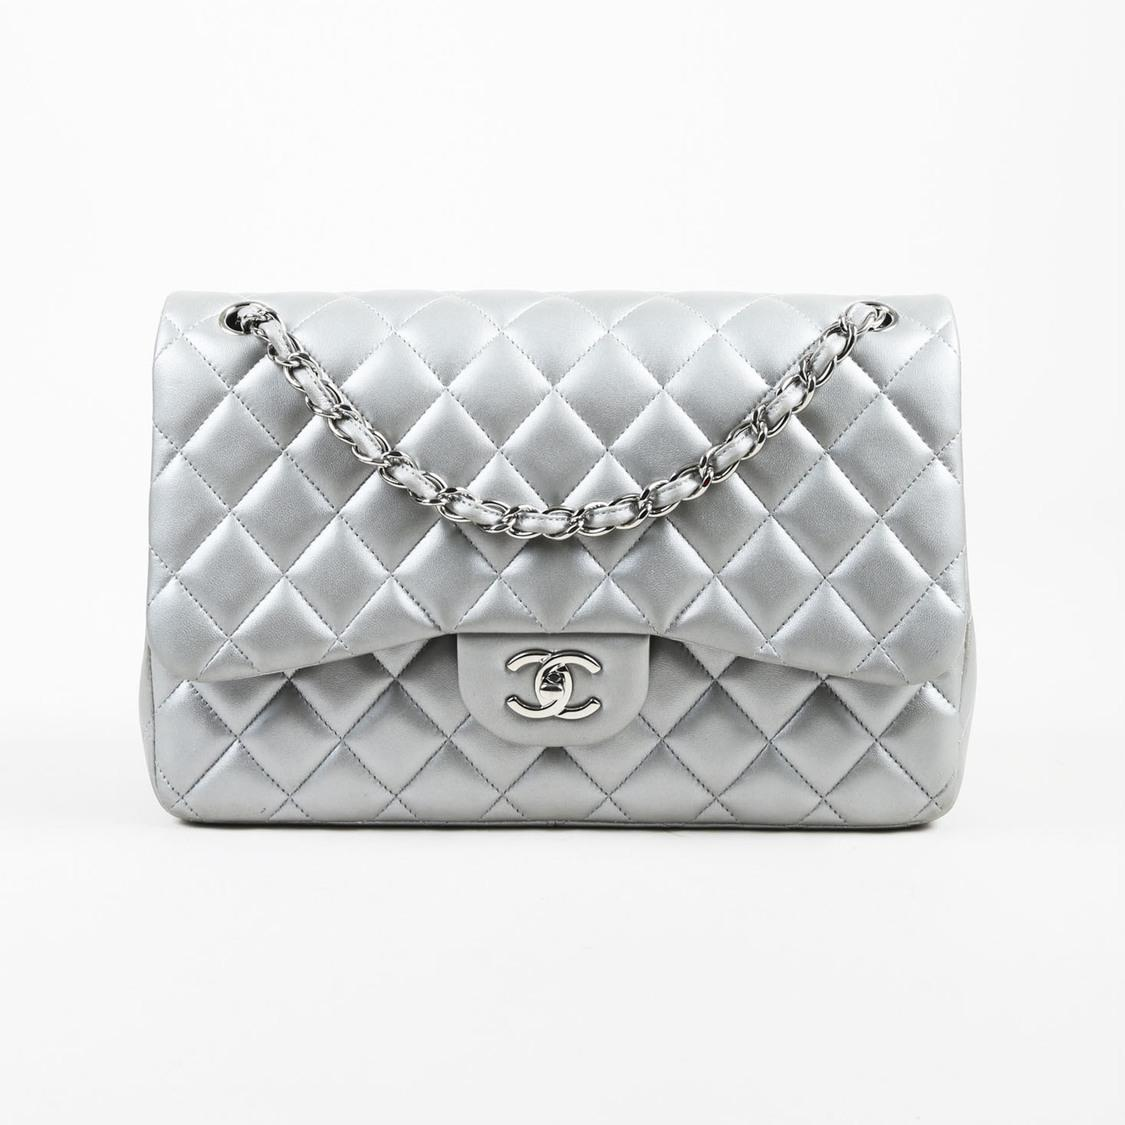 5f826232cb23b2 Chanel Metallic Silver Lambskin Quilted Jumbo Classic Double Flap ...